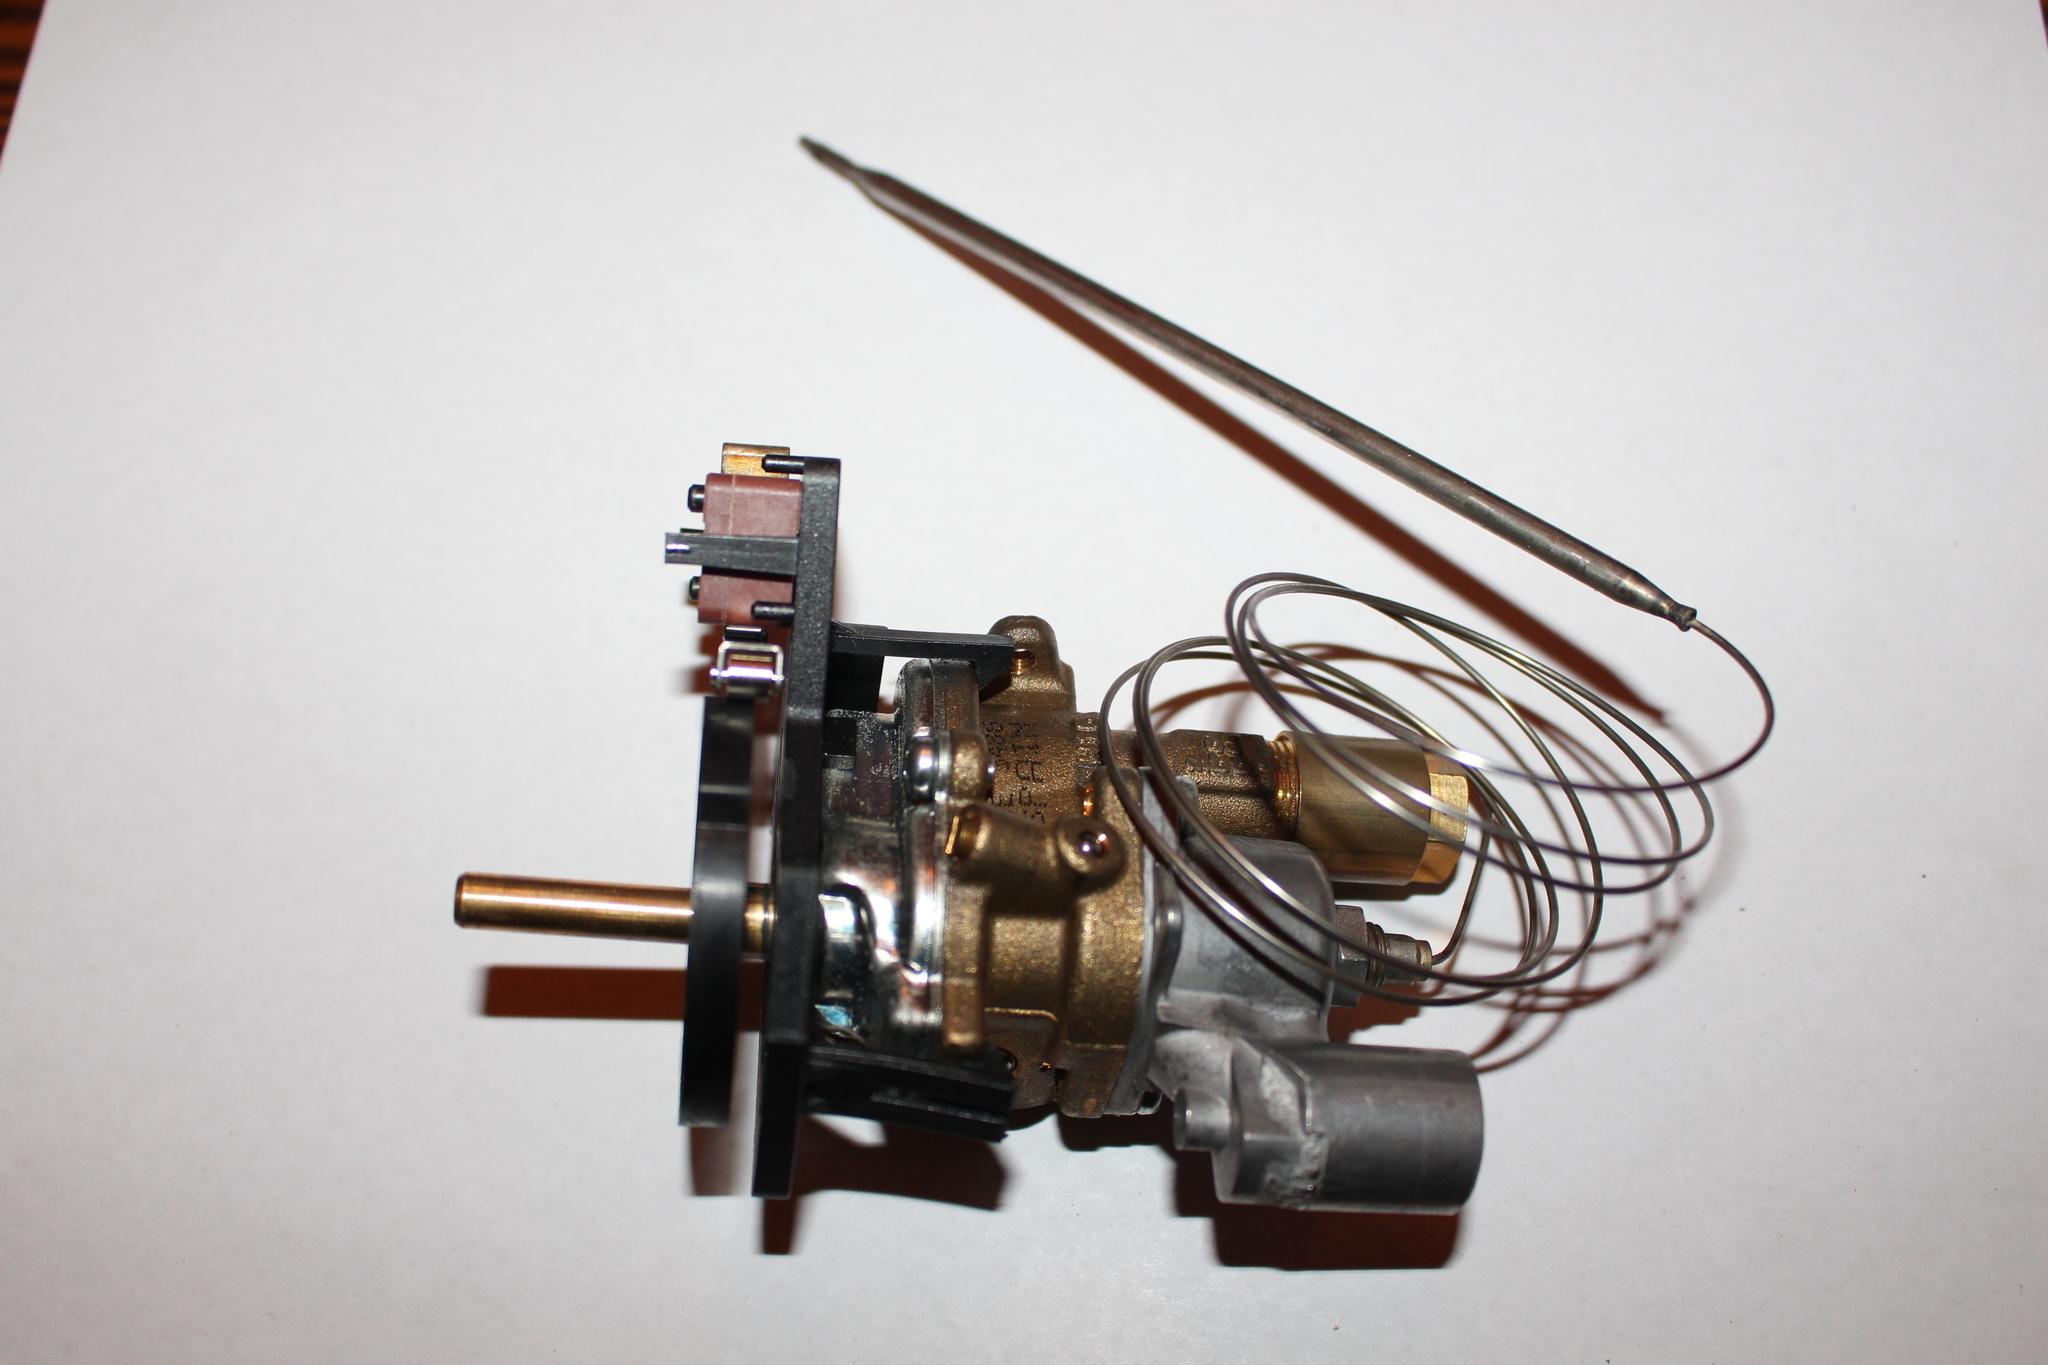 Universal Italy Термостат (терморегулятор) для плиты: Термостат для духовки Fagor (Фагор)- C150013K6